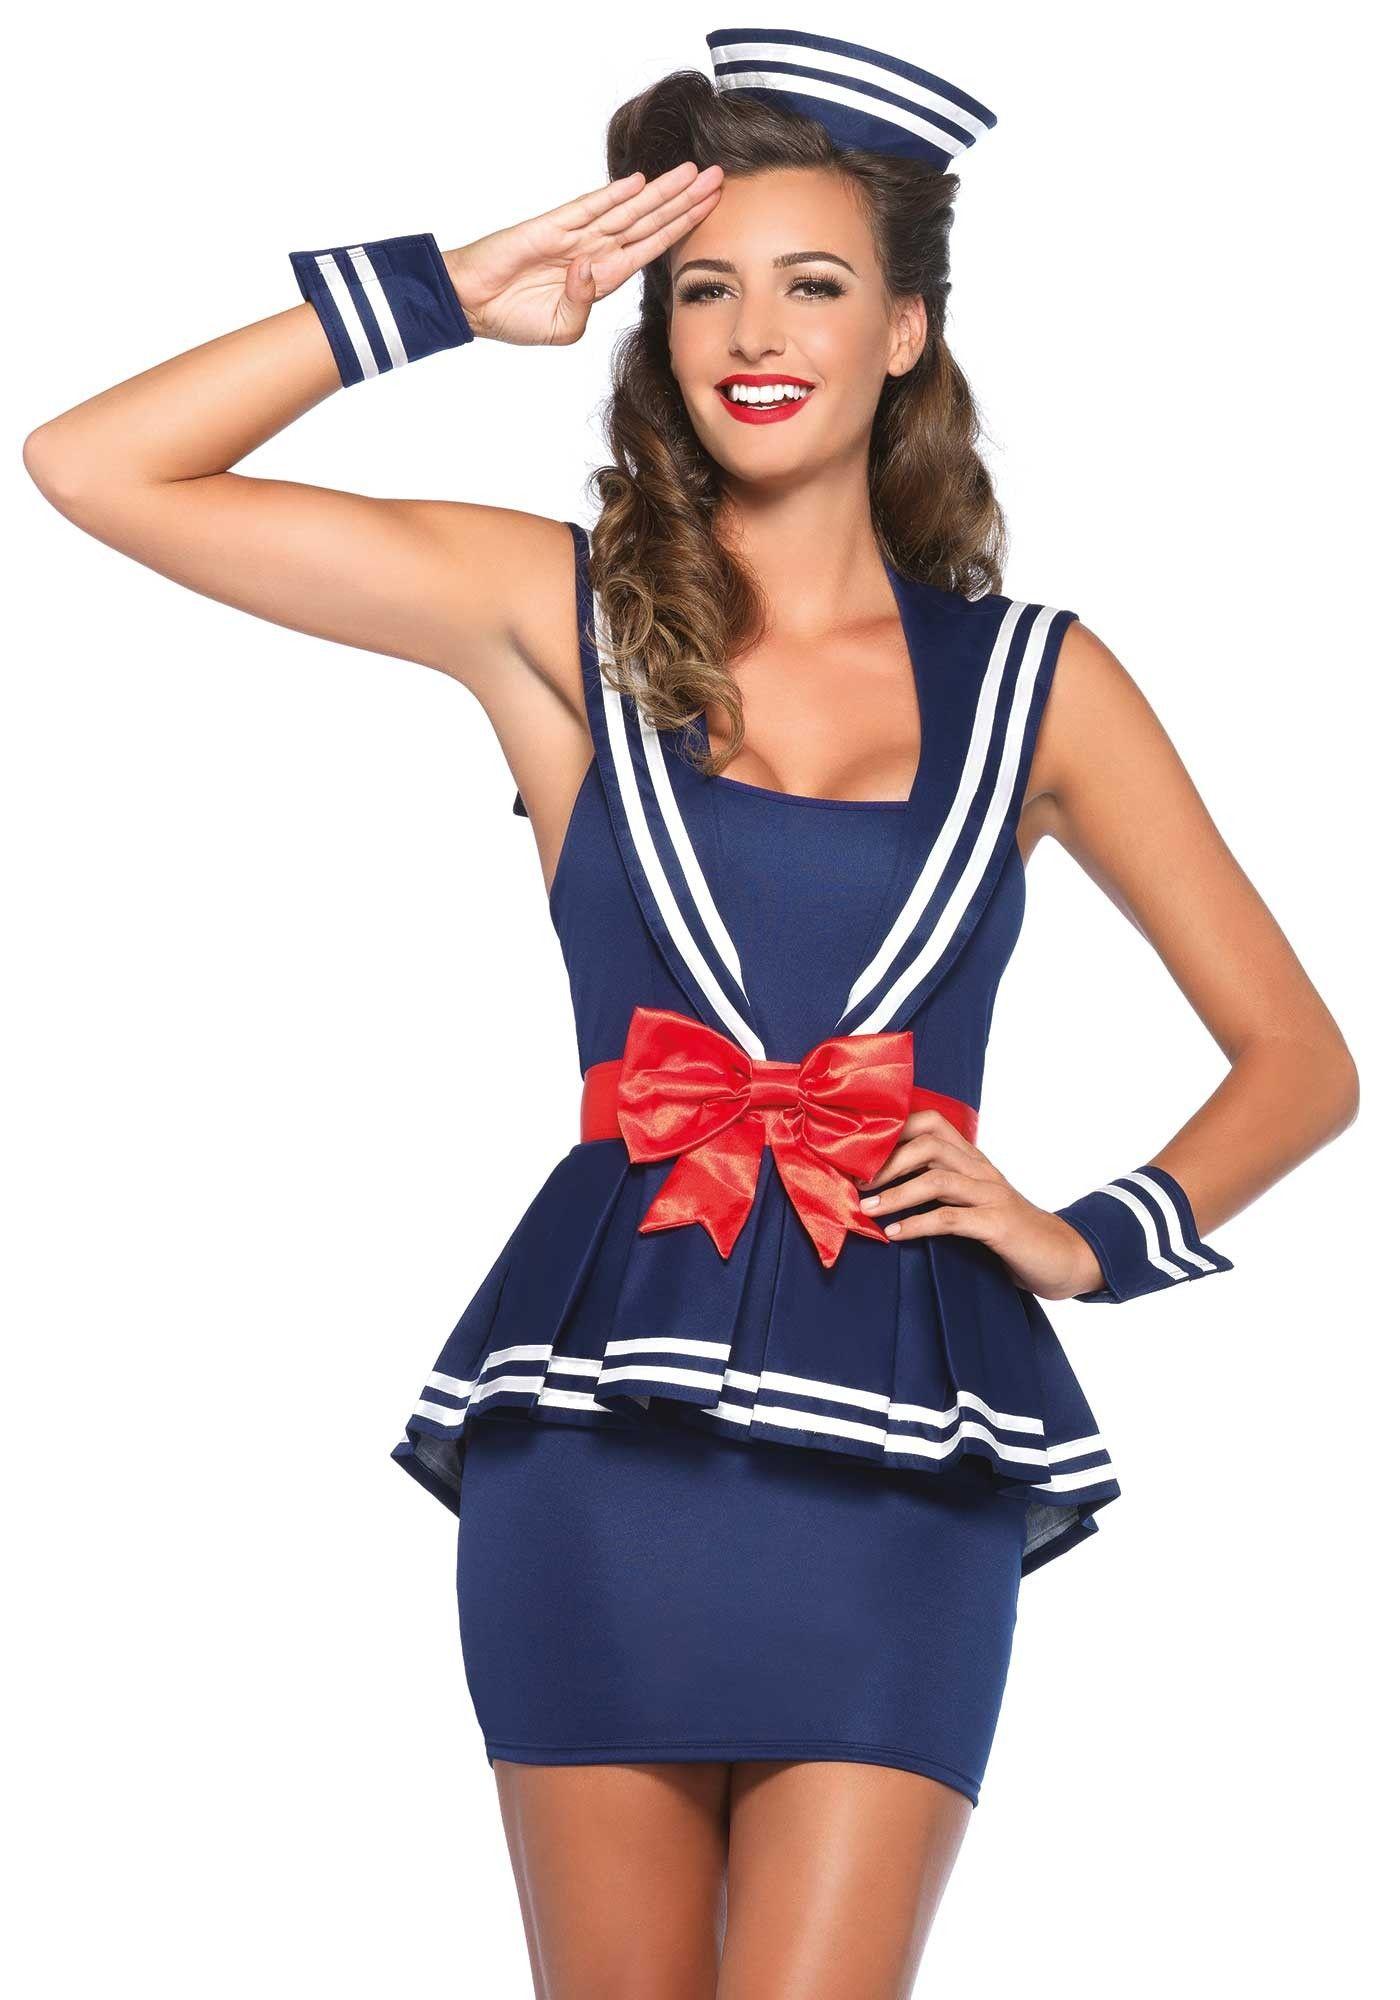 bdca7442f50b2 ... retro chic Sailor Girl plus size costume dress for women. Sailor costume